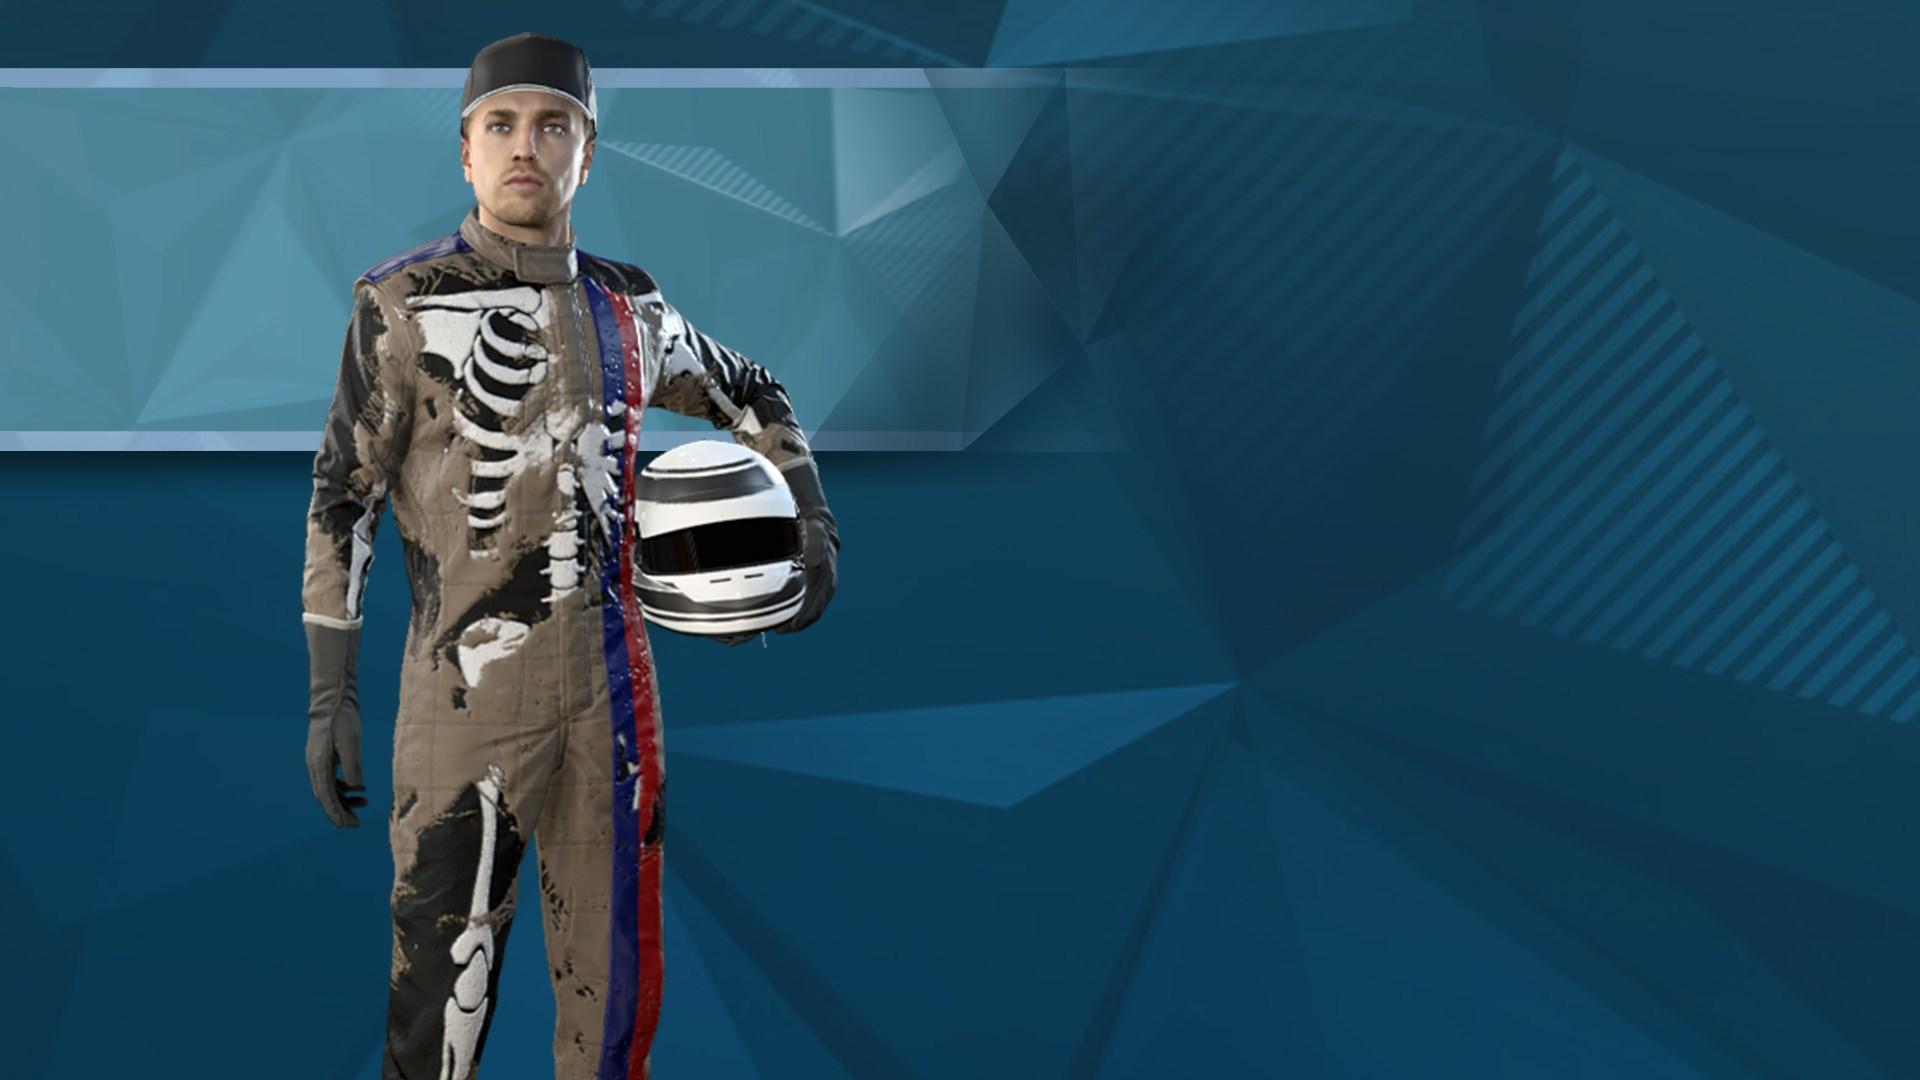 F1® 2019: Suit 'Halloween Edition'